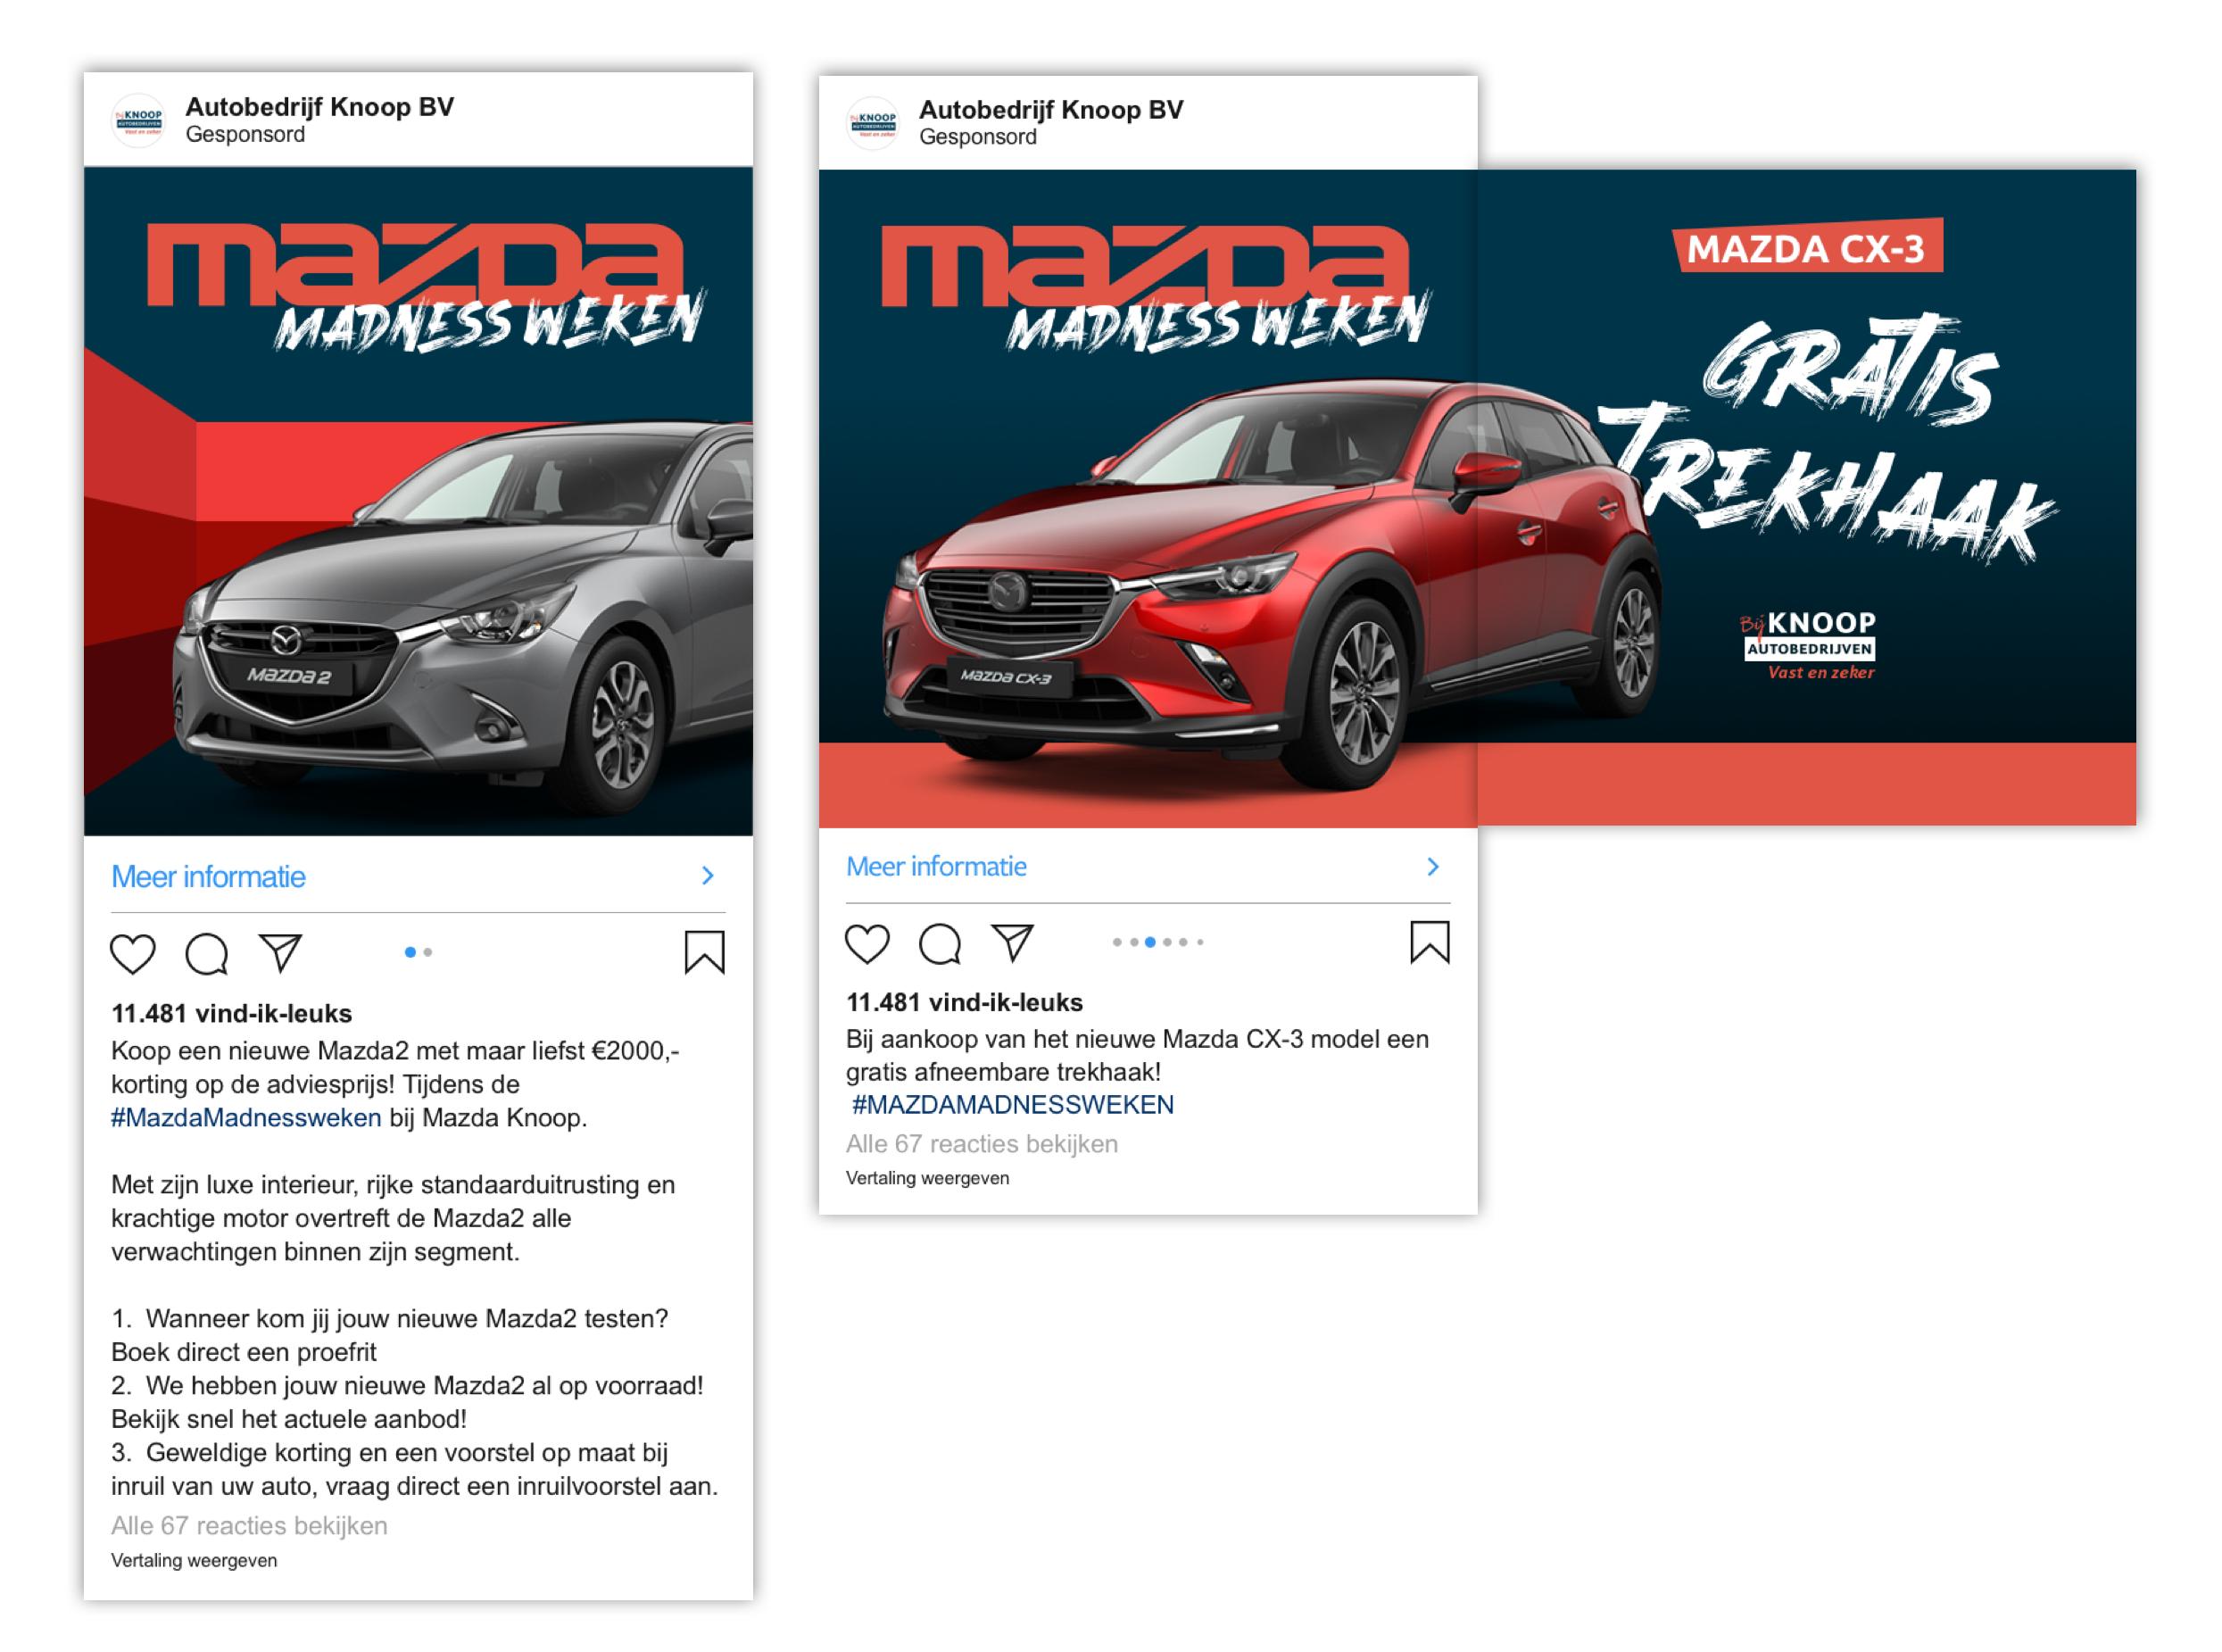 Mazda madness ads